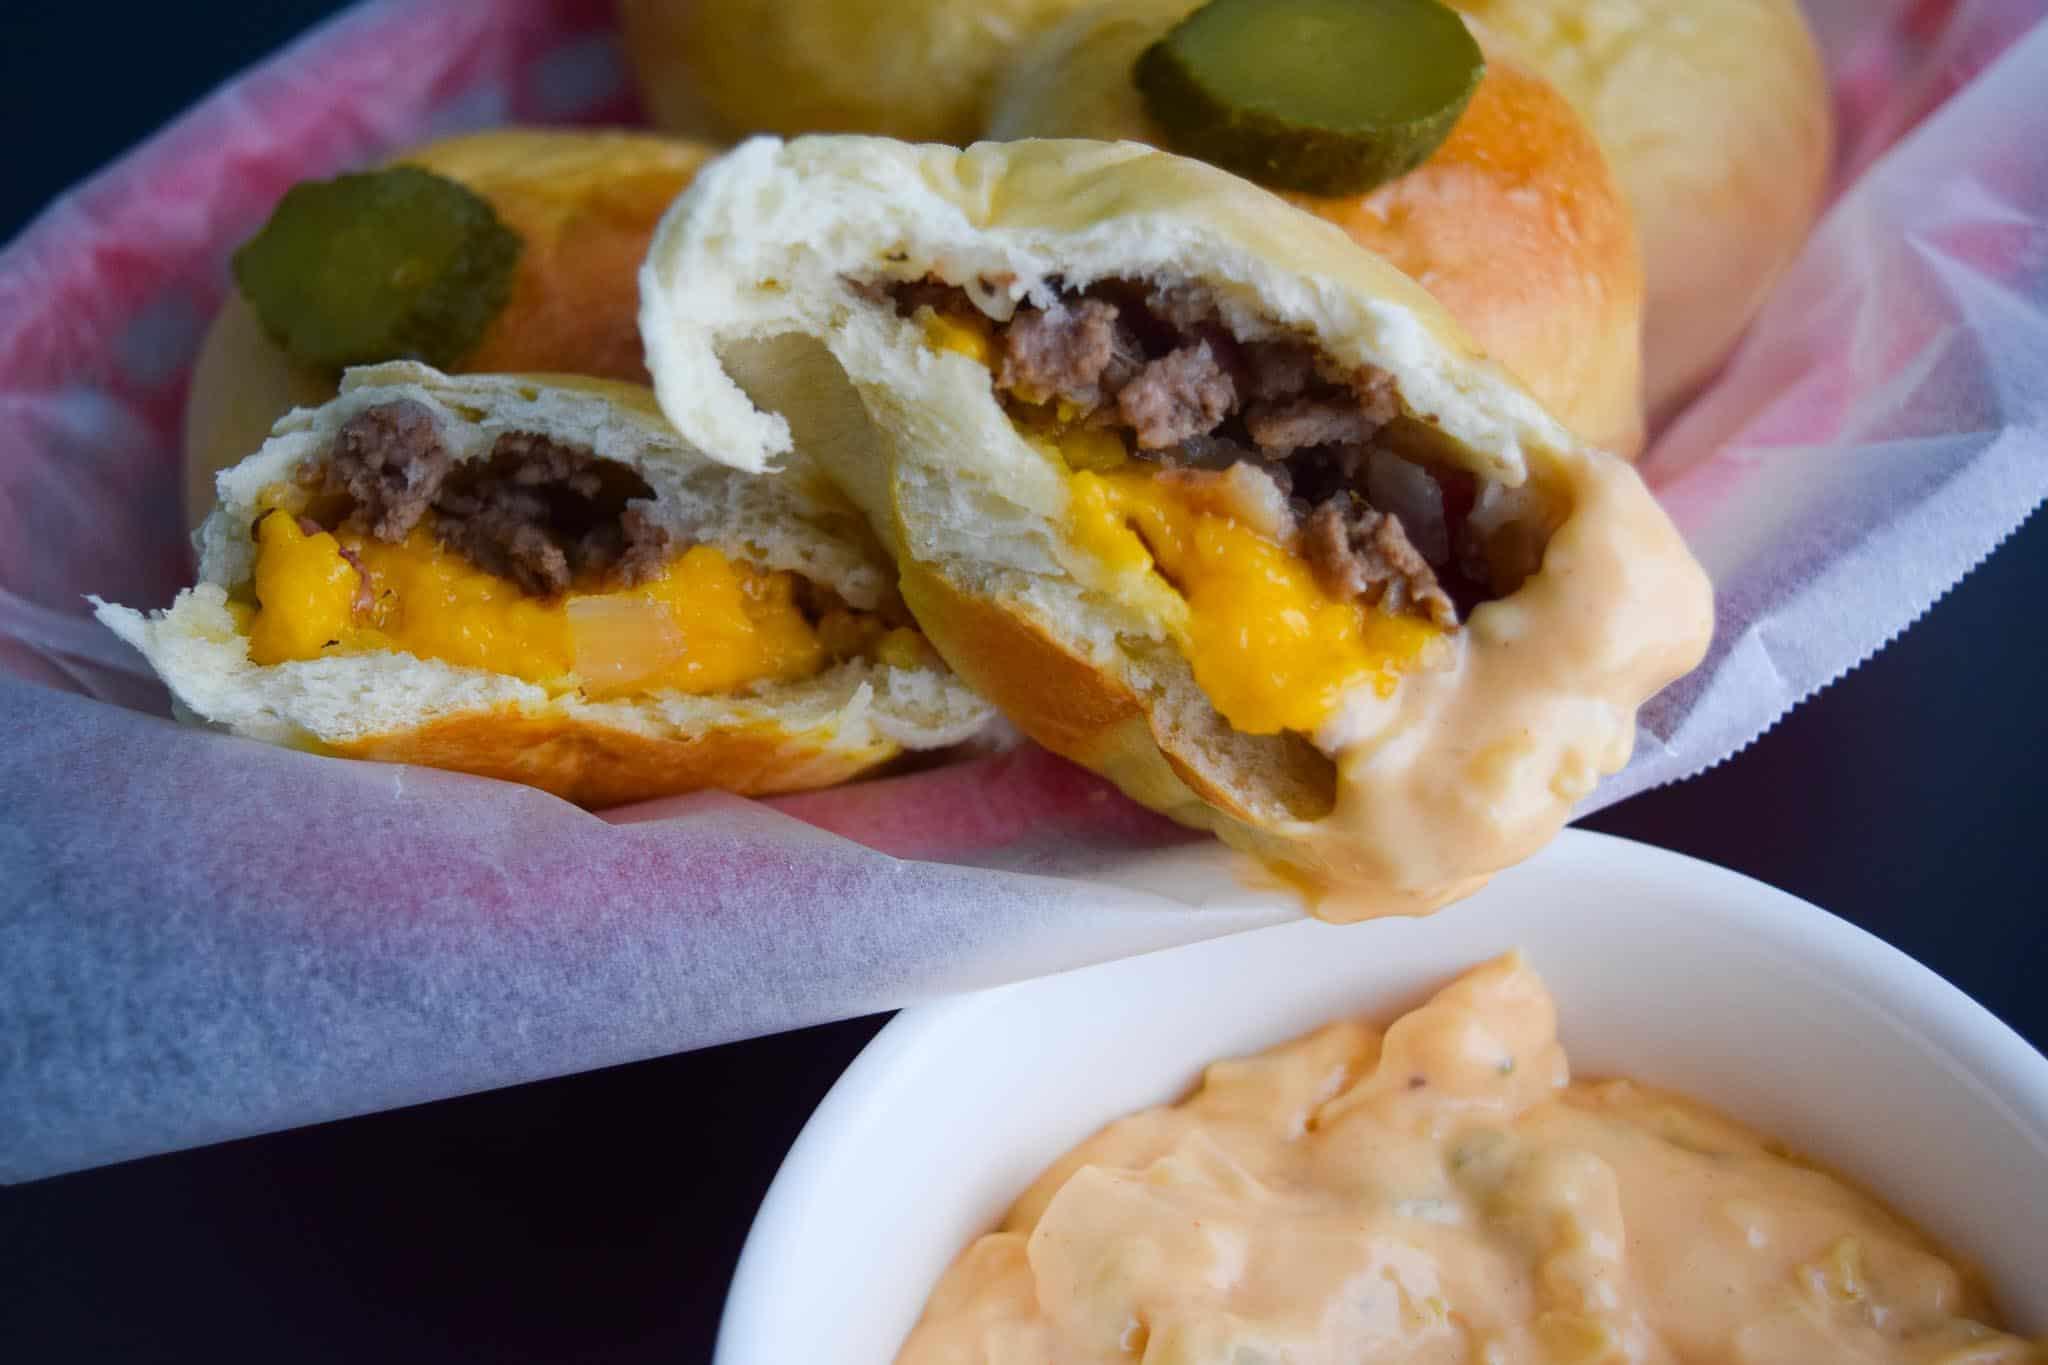 Bacon Cheeseburger Bombs dipped in Big Mac Sauce close up view